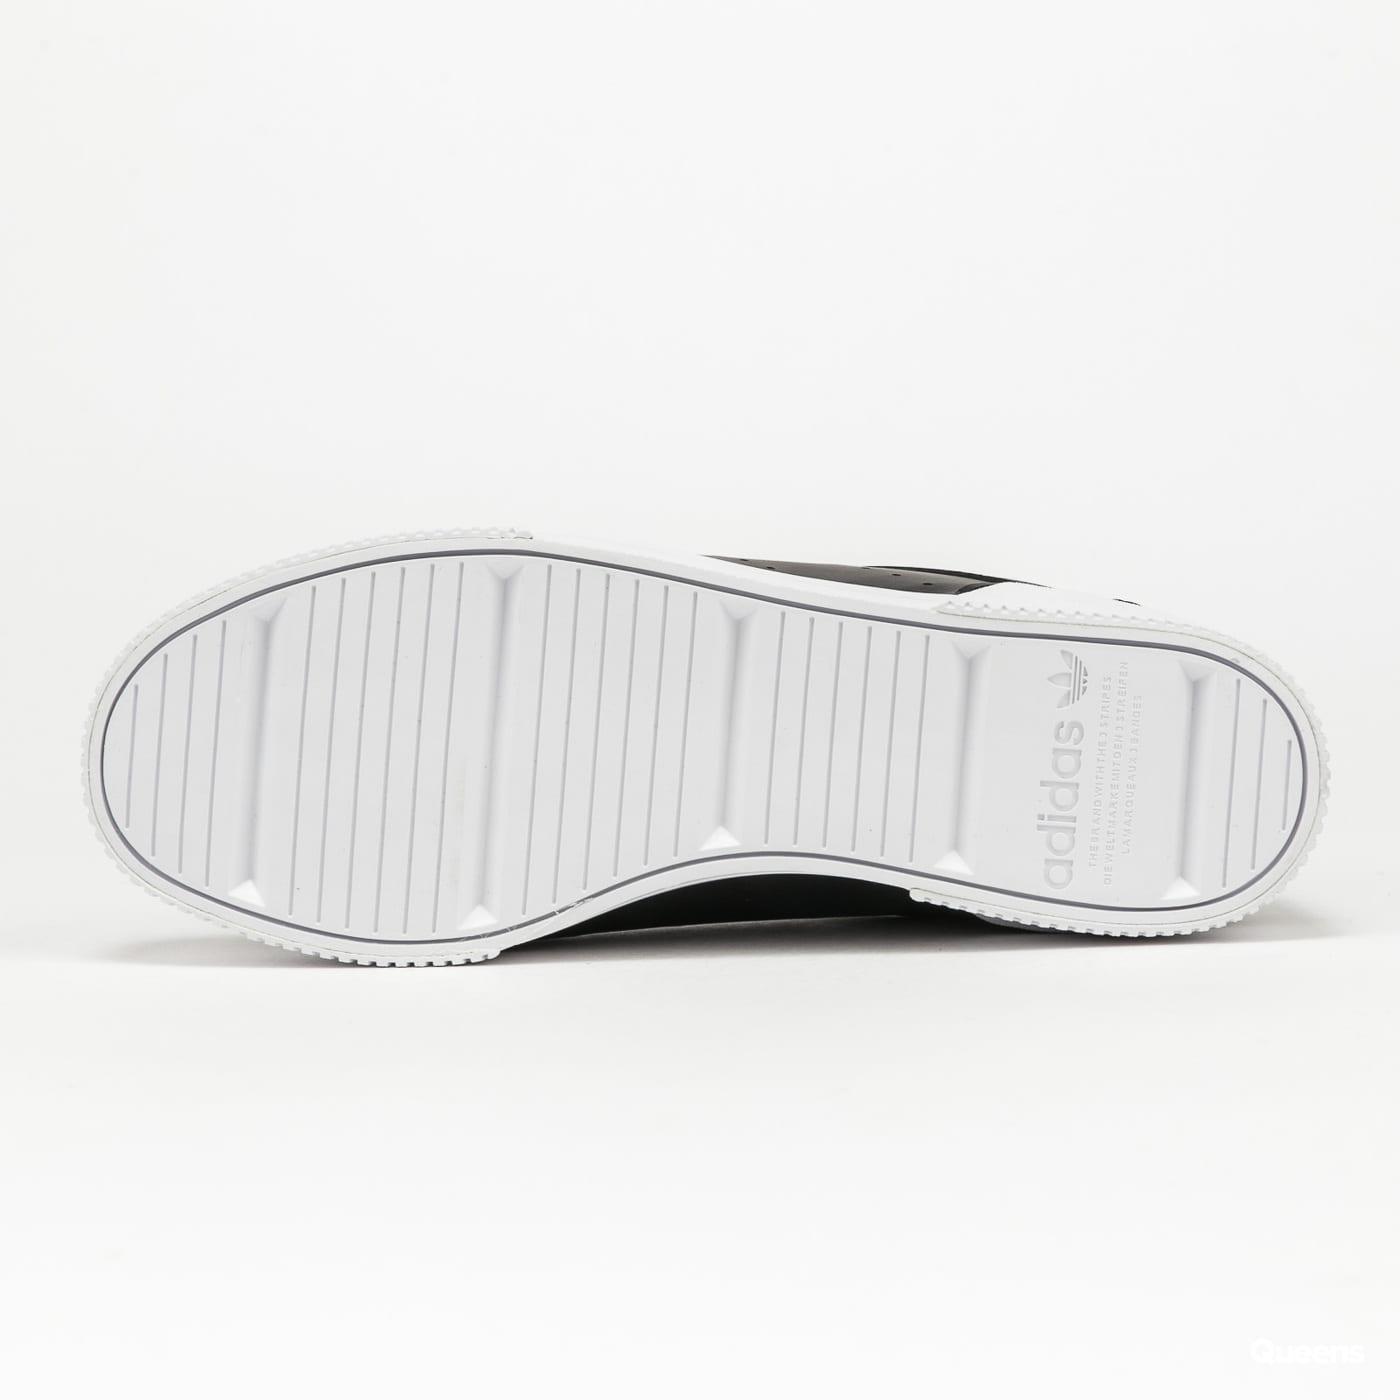 adidas Originals Court Tourino cblack / ftwwht / ftwwht